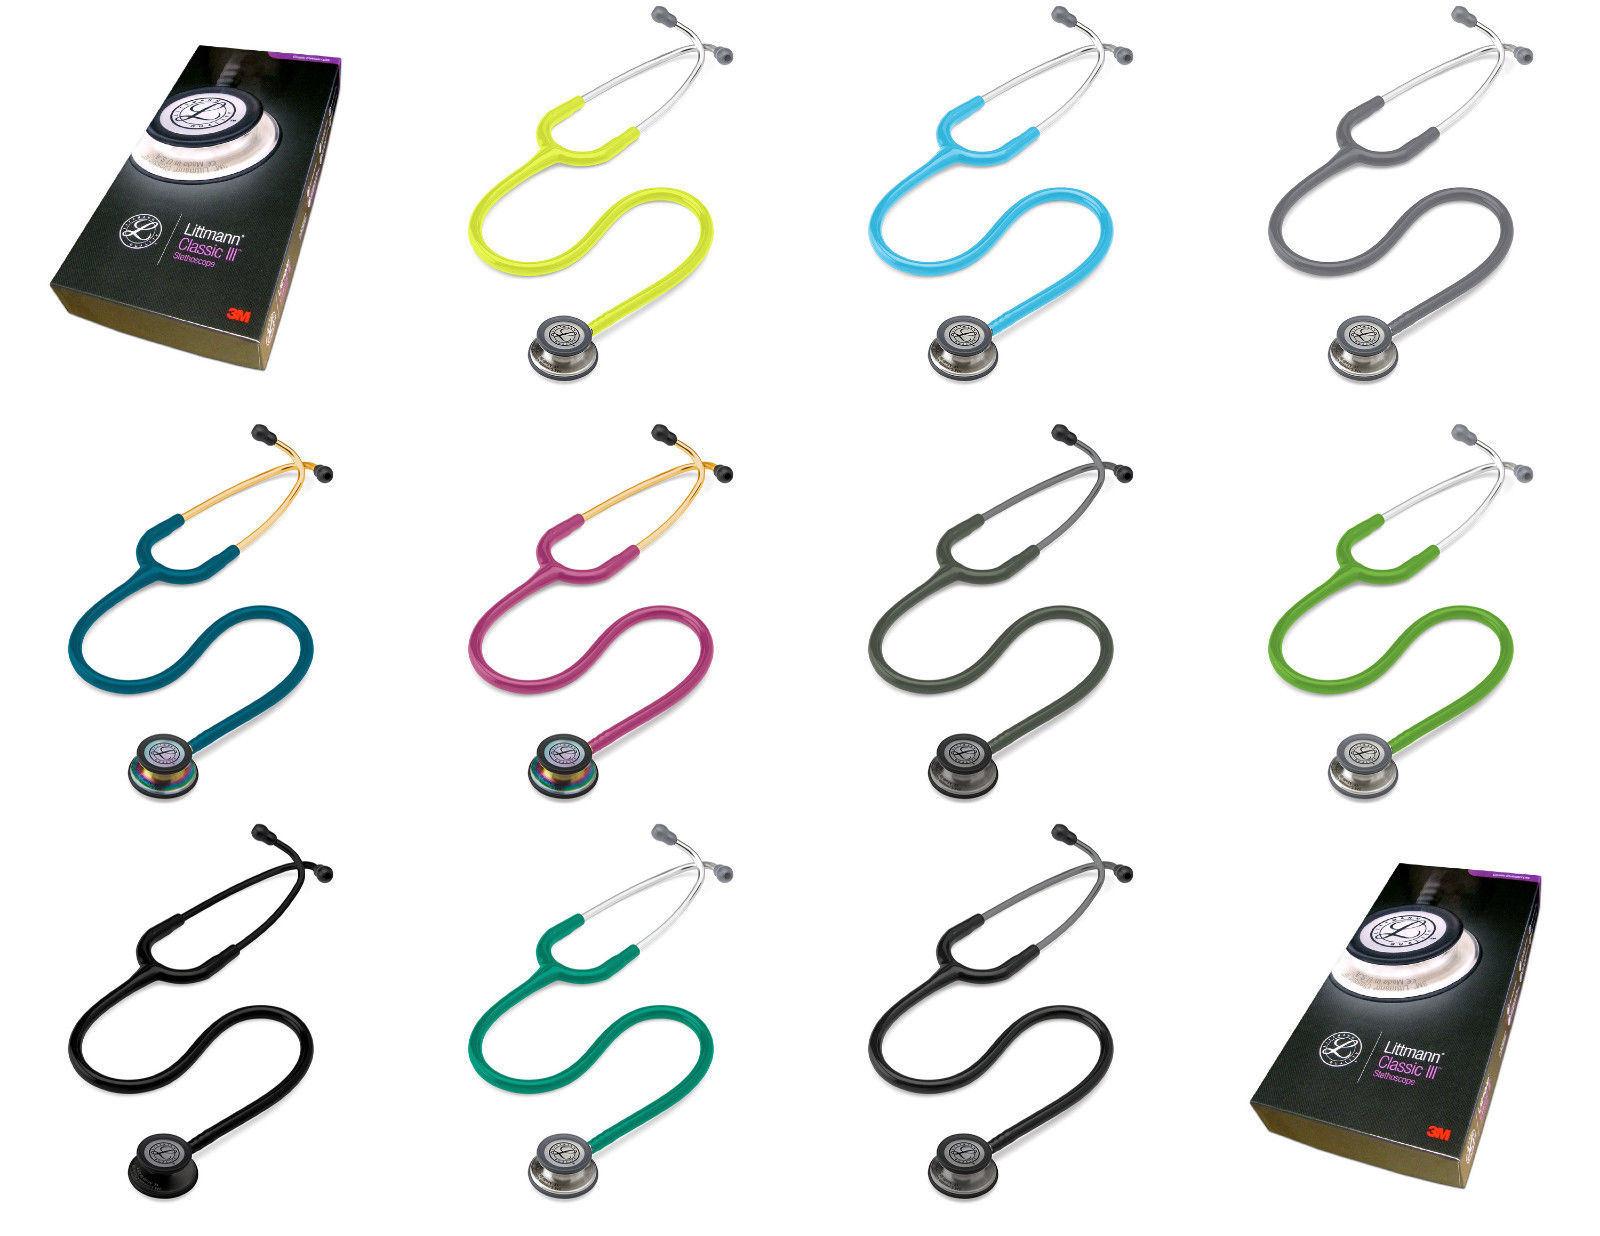 Cardiology Dual Head 3m Littmann Classic III Stethoscope